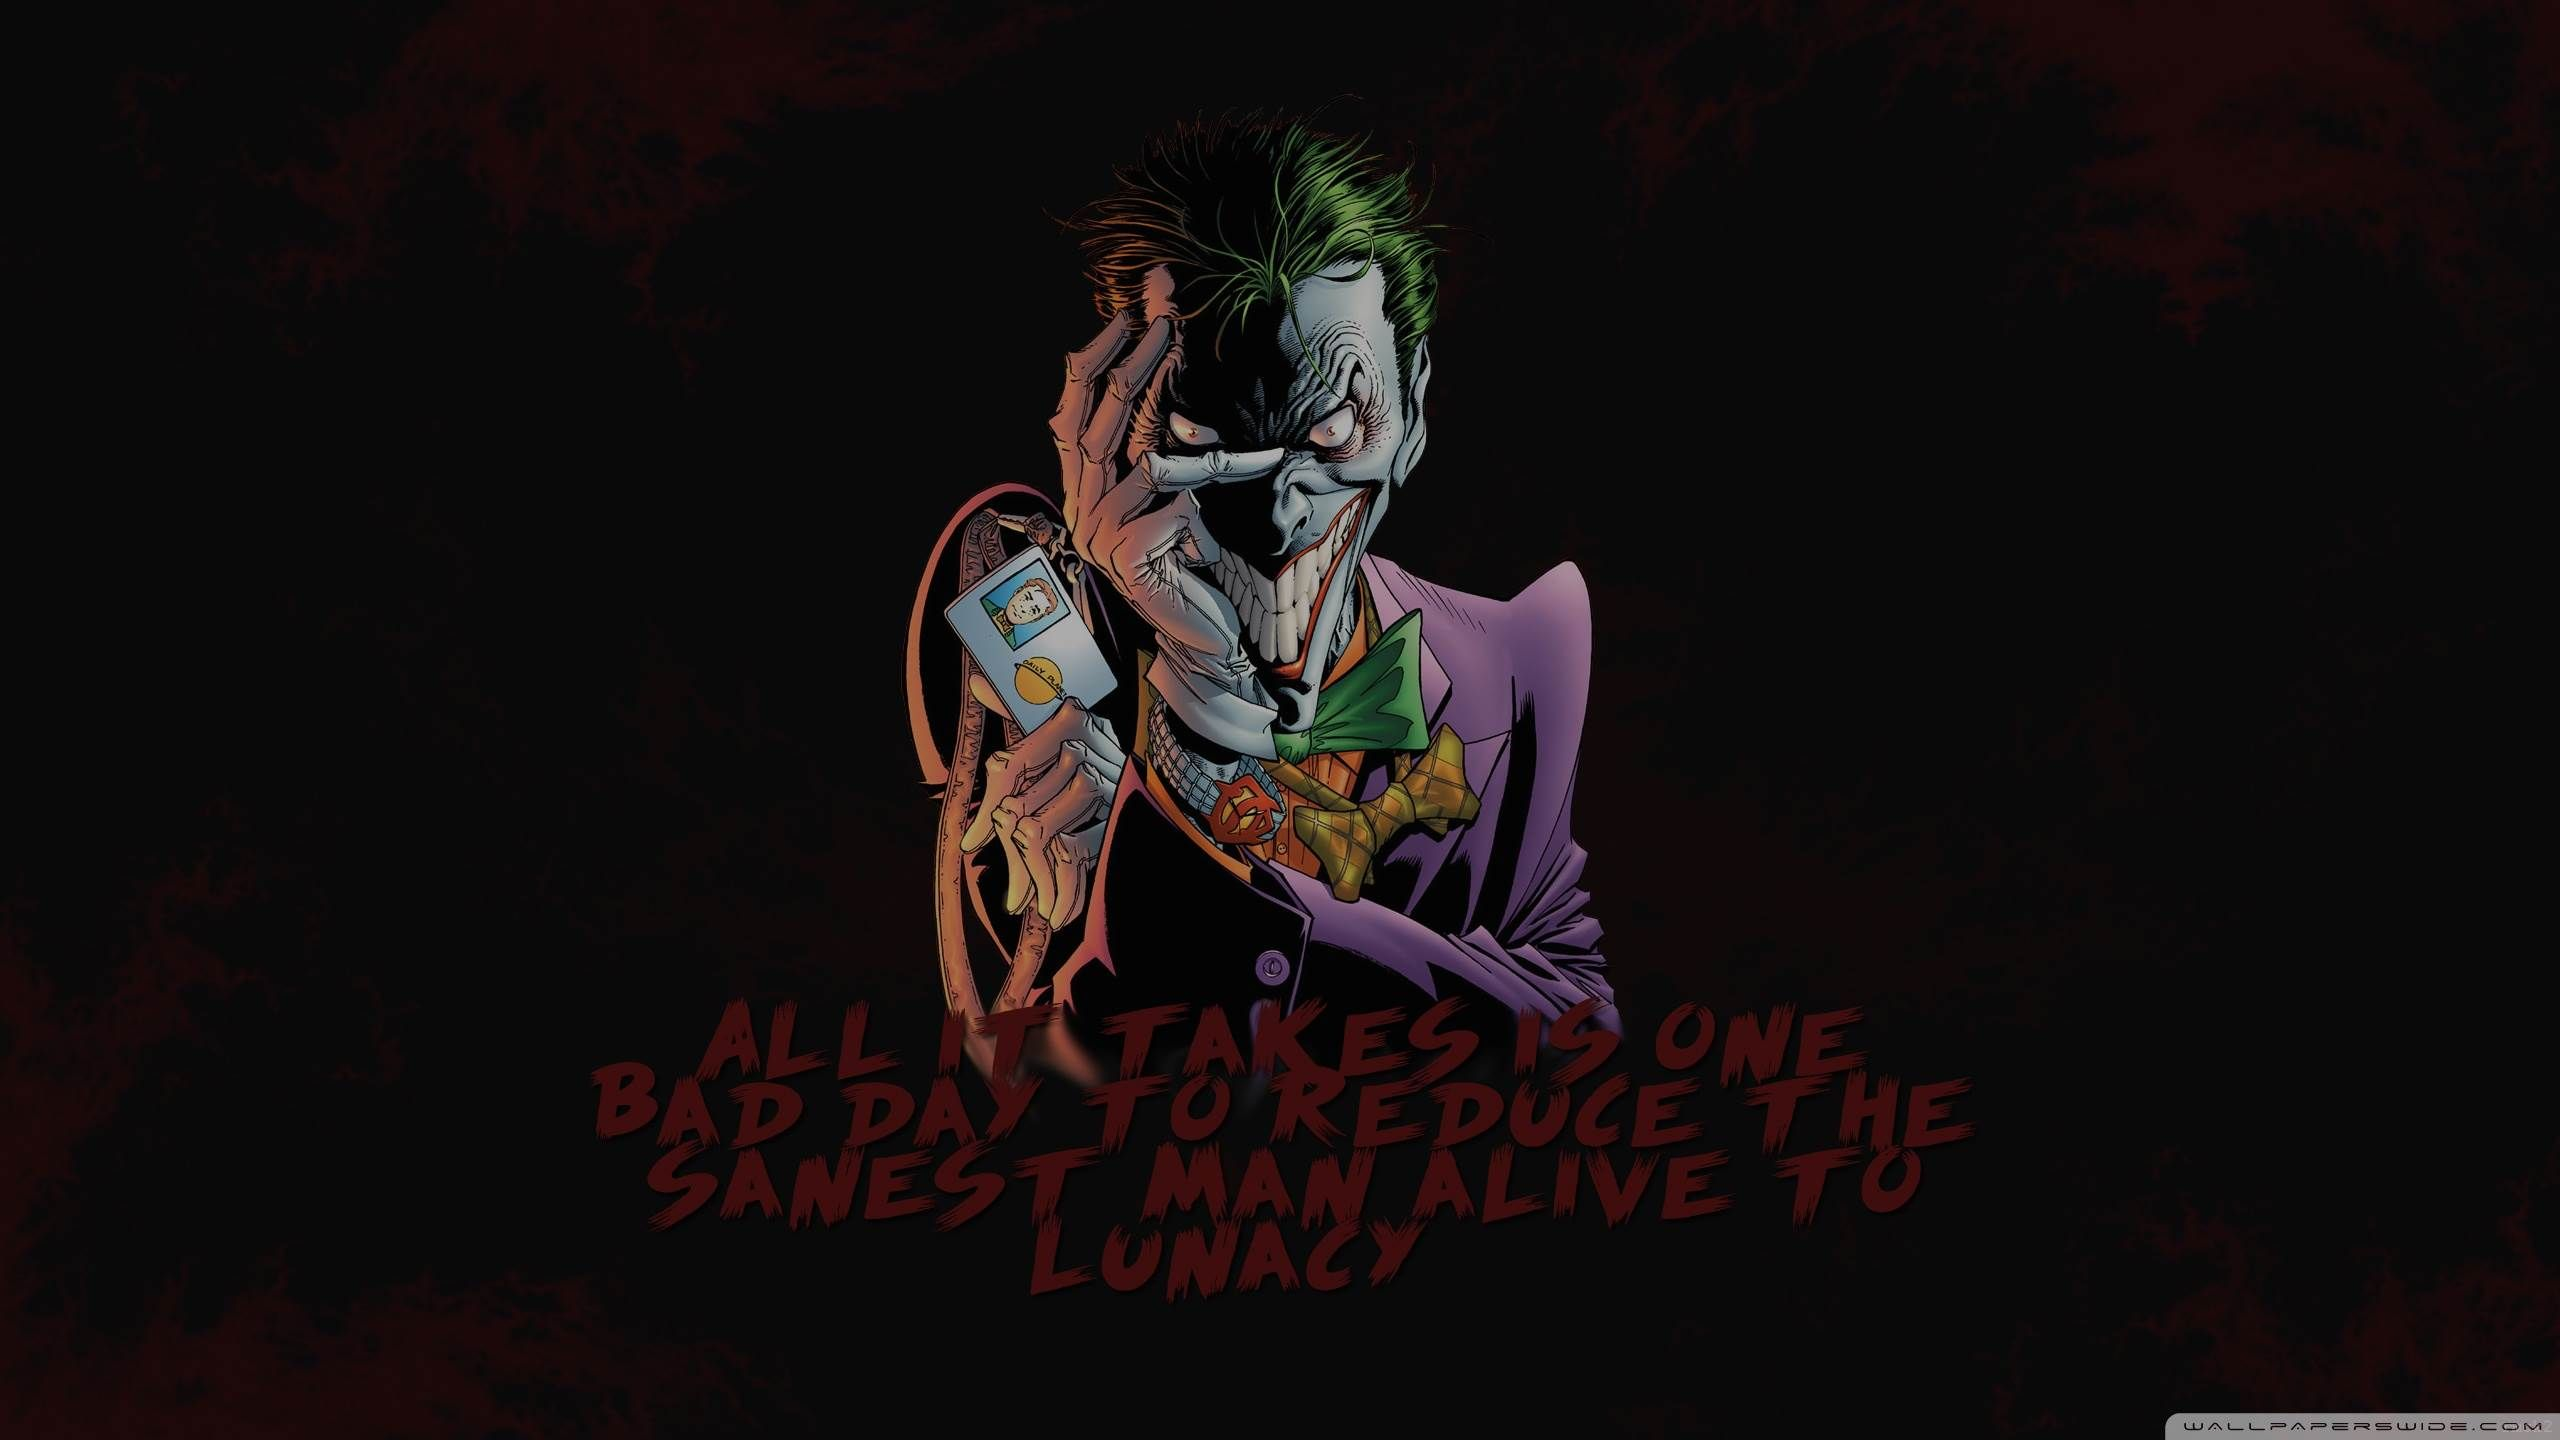 batman and joker wallpapers wallpaper 2560×1440 joker images